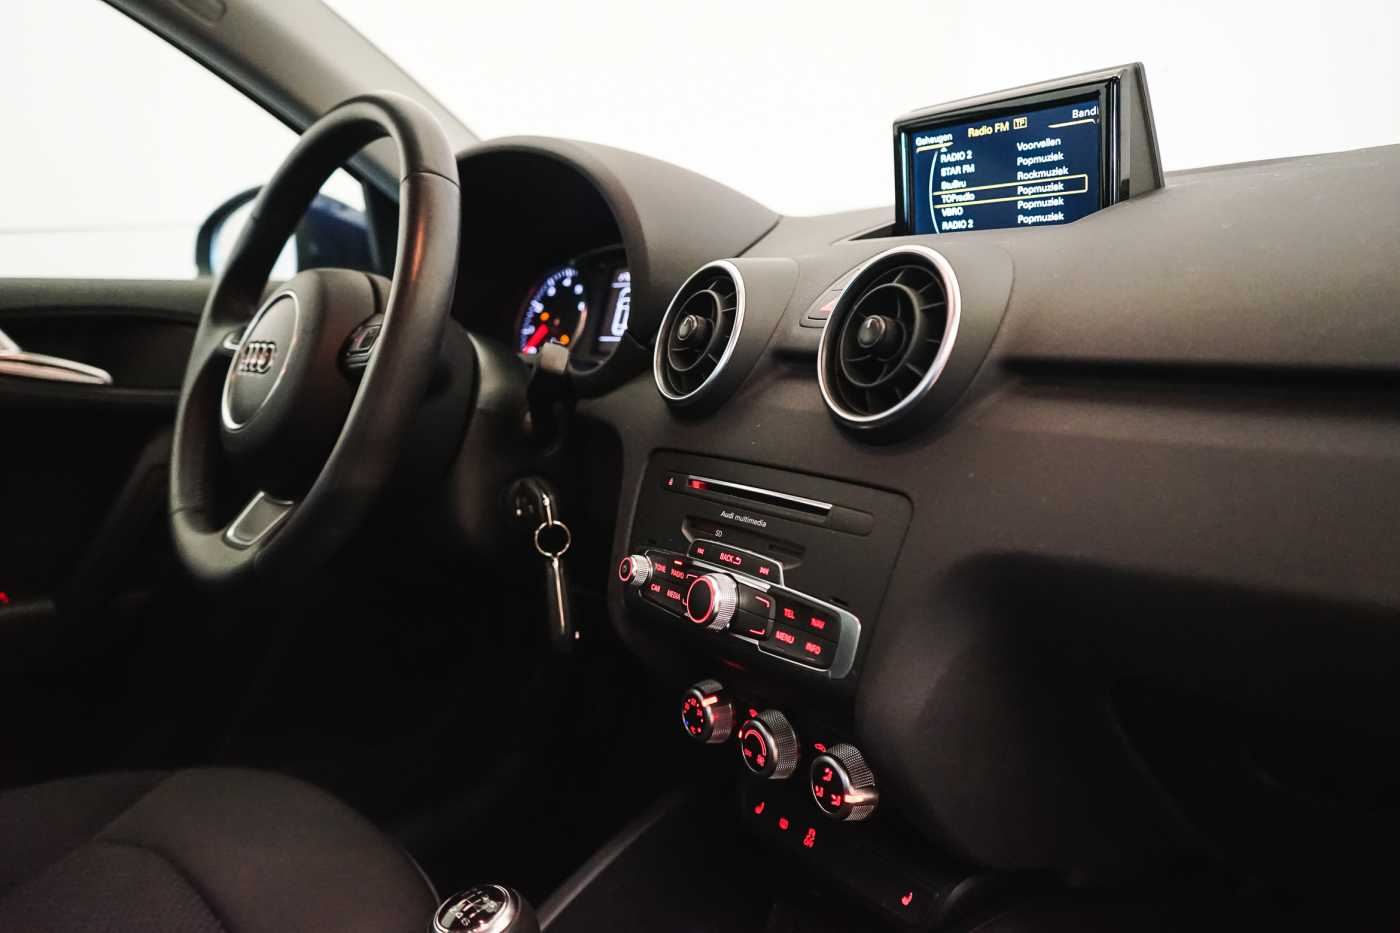 Audi A1 Proline Admired S-Line // Bluetooth, Zetelverwarming, Airco 12/31